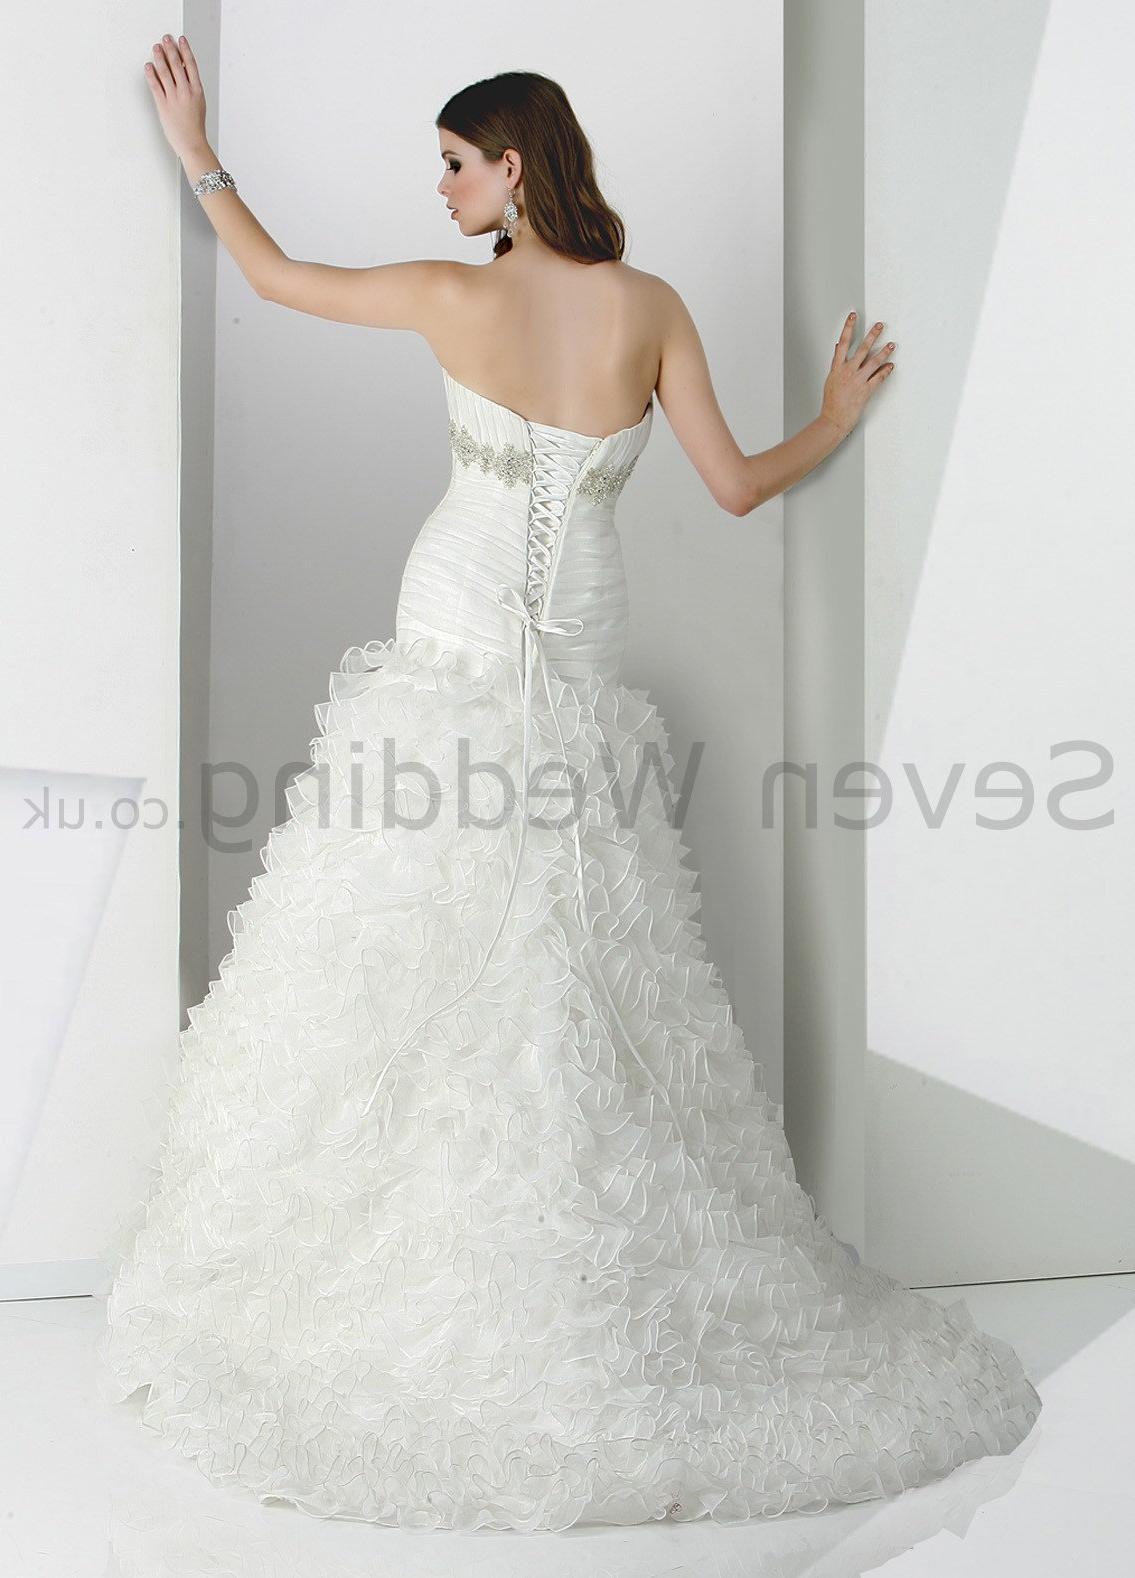 Wedding Dresses Dillards : Dillards wedding registry